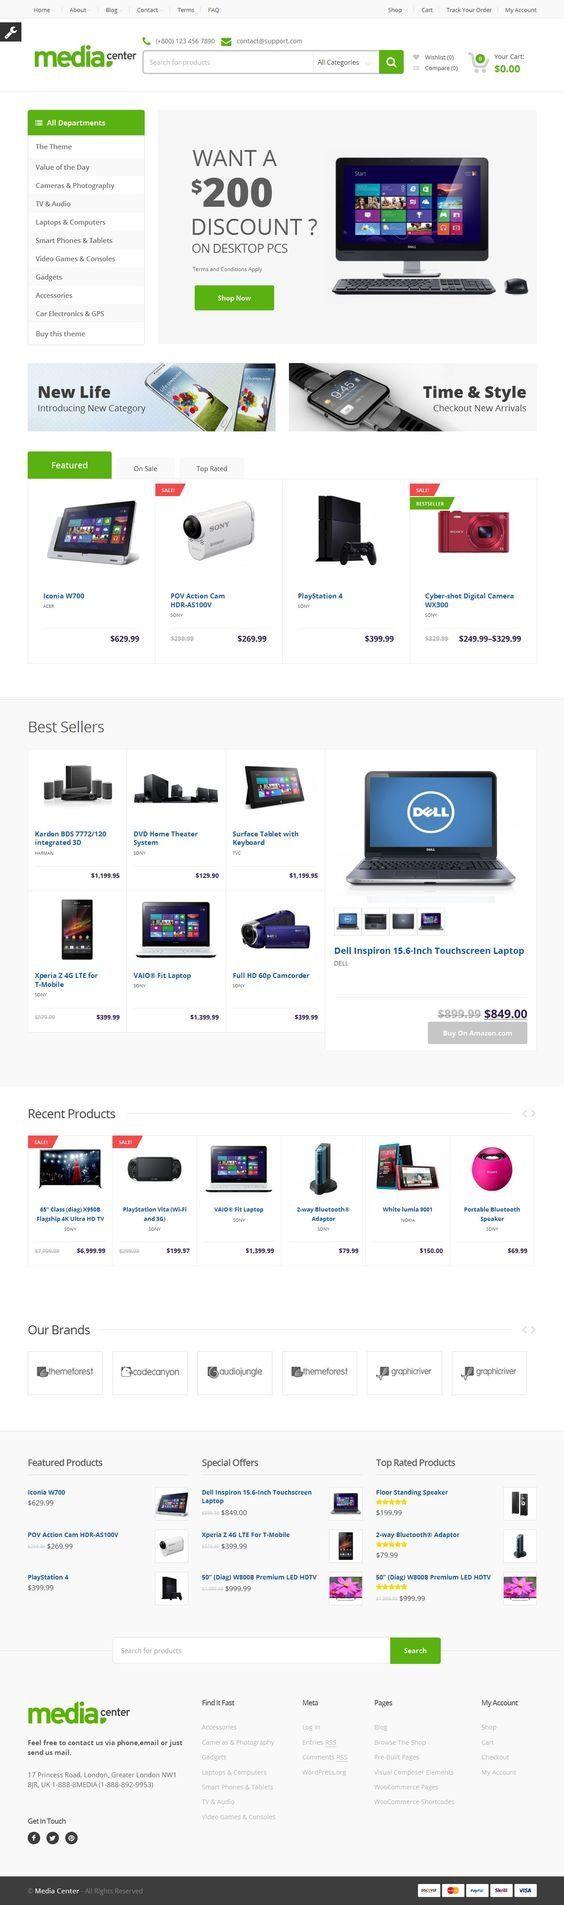 MediaCenter - Electronics Store WooCommerce Theme. Download: http://themeforest.net/item/mediacenter-electronics-store-woocommerce-theme/9177409?ref=skarin